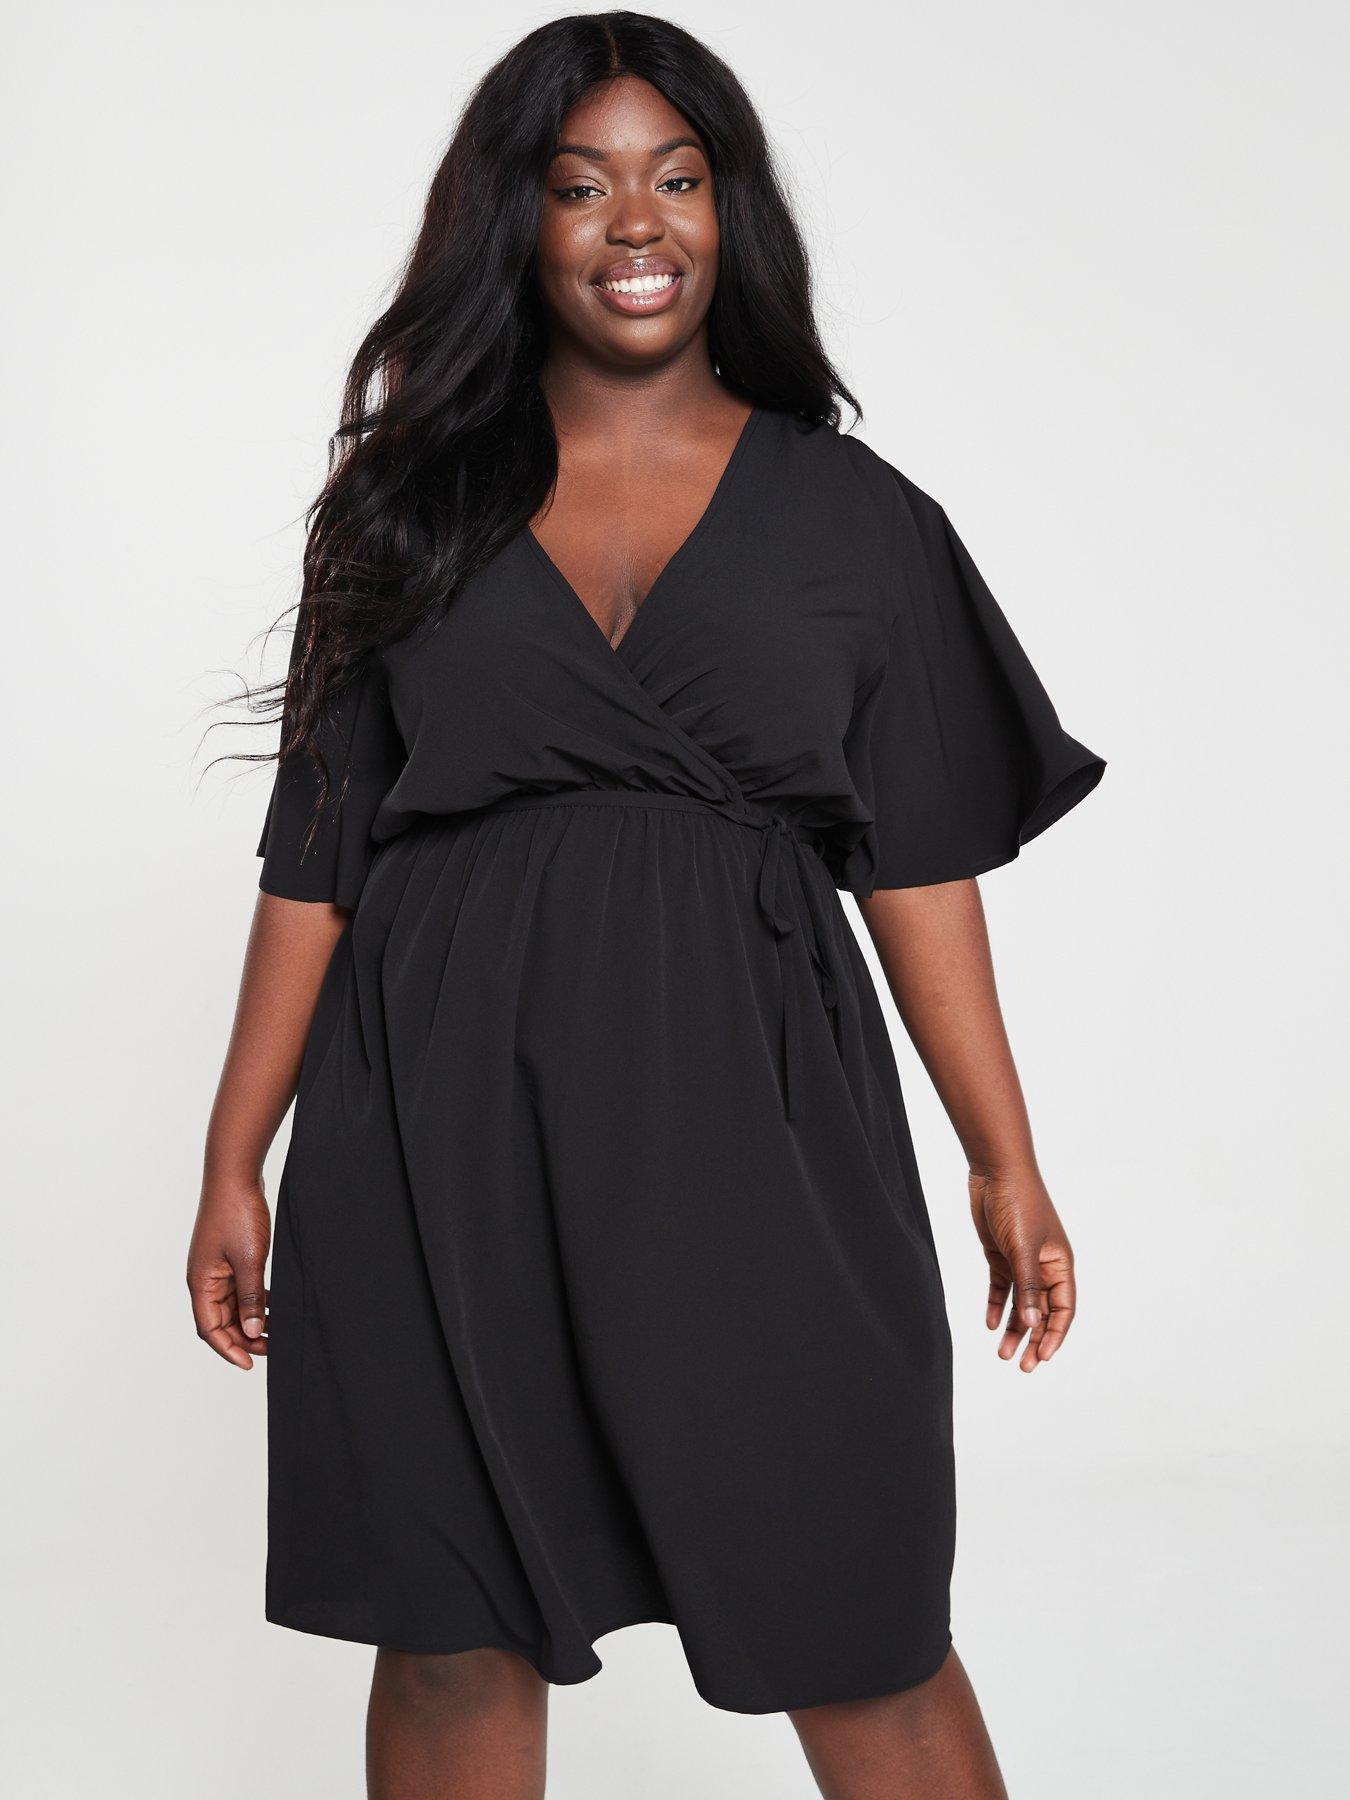 Black Dress UK